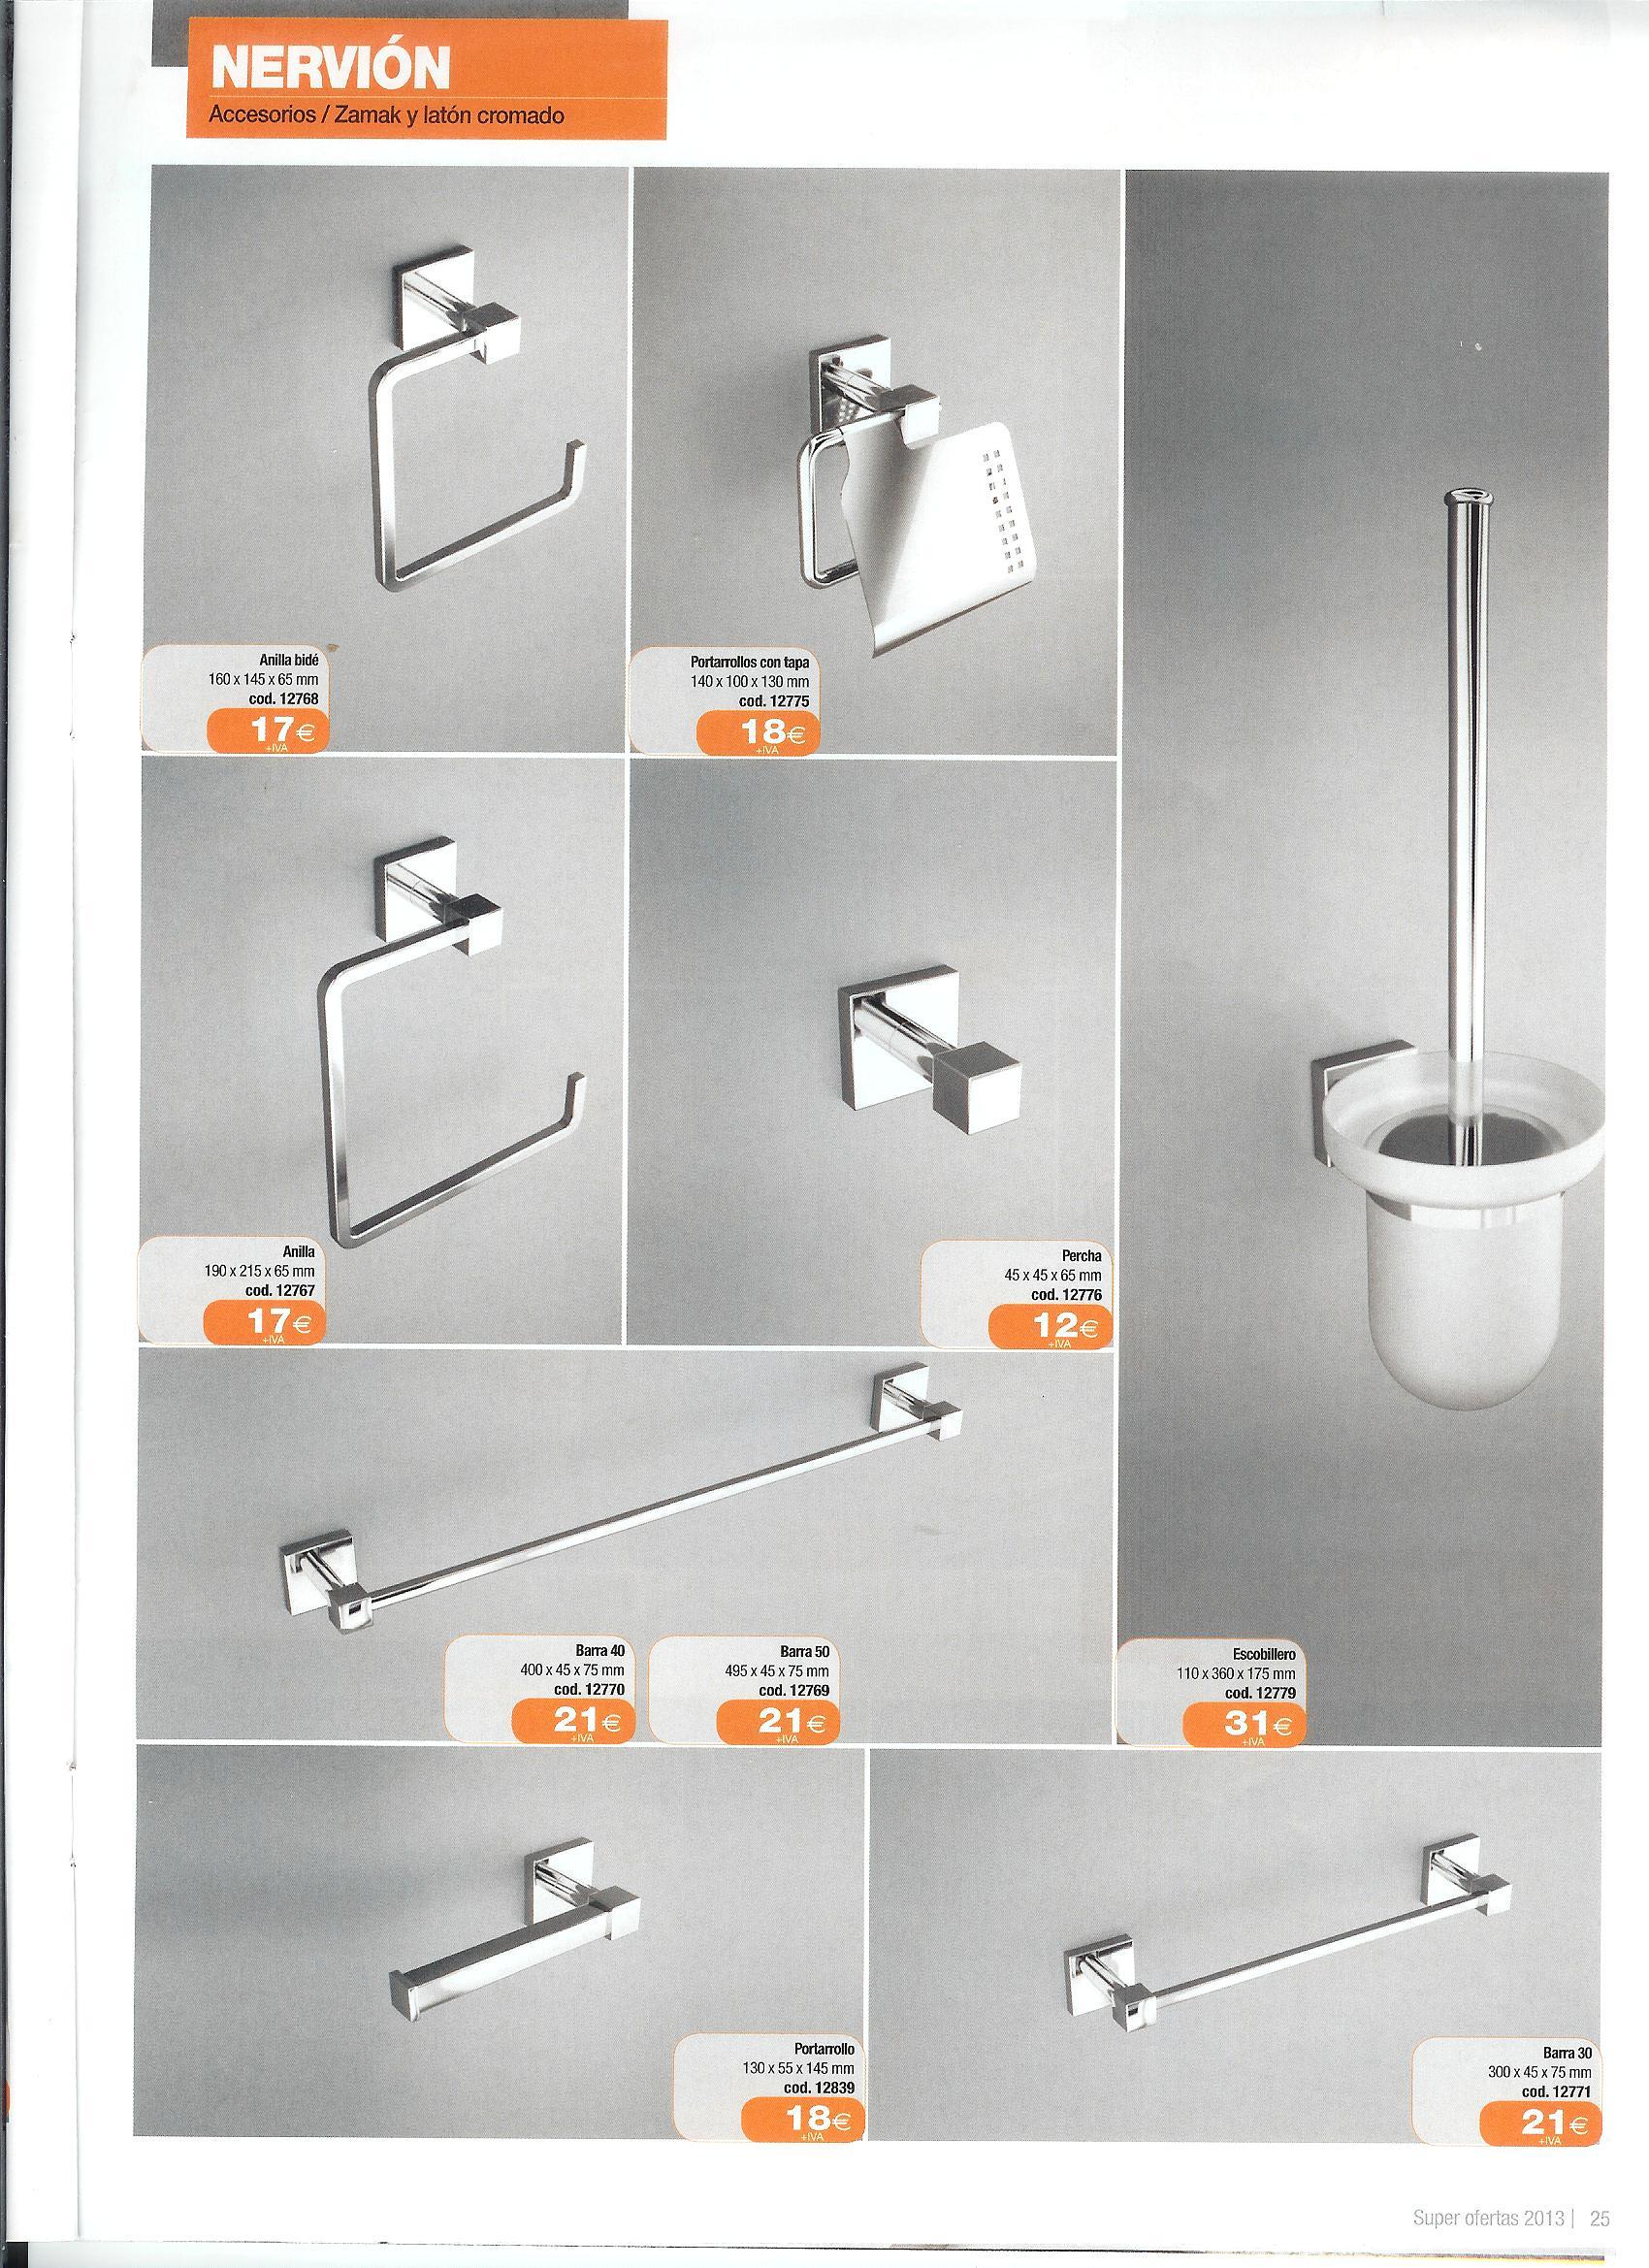 Accesorios de ba o color wengue for Accesorios bano color blanco